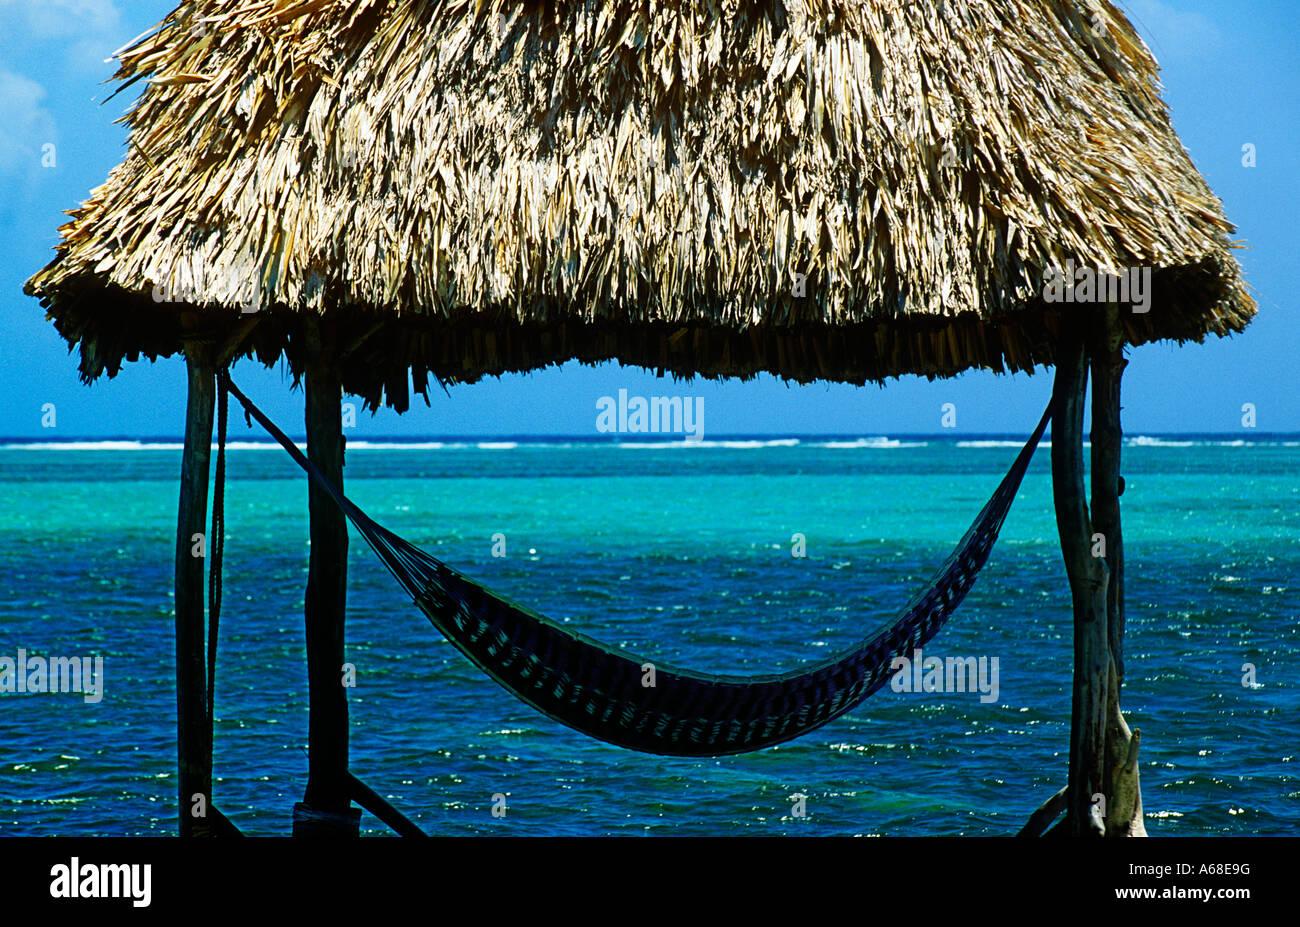 cabana with hammock overlooking aqua tropical waters ambergris caye belize cabana with hammock overlooking aqua tropical waters ambergris      rh   alamy